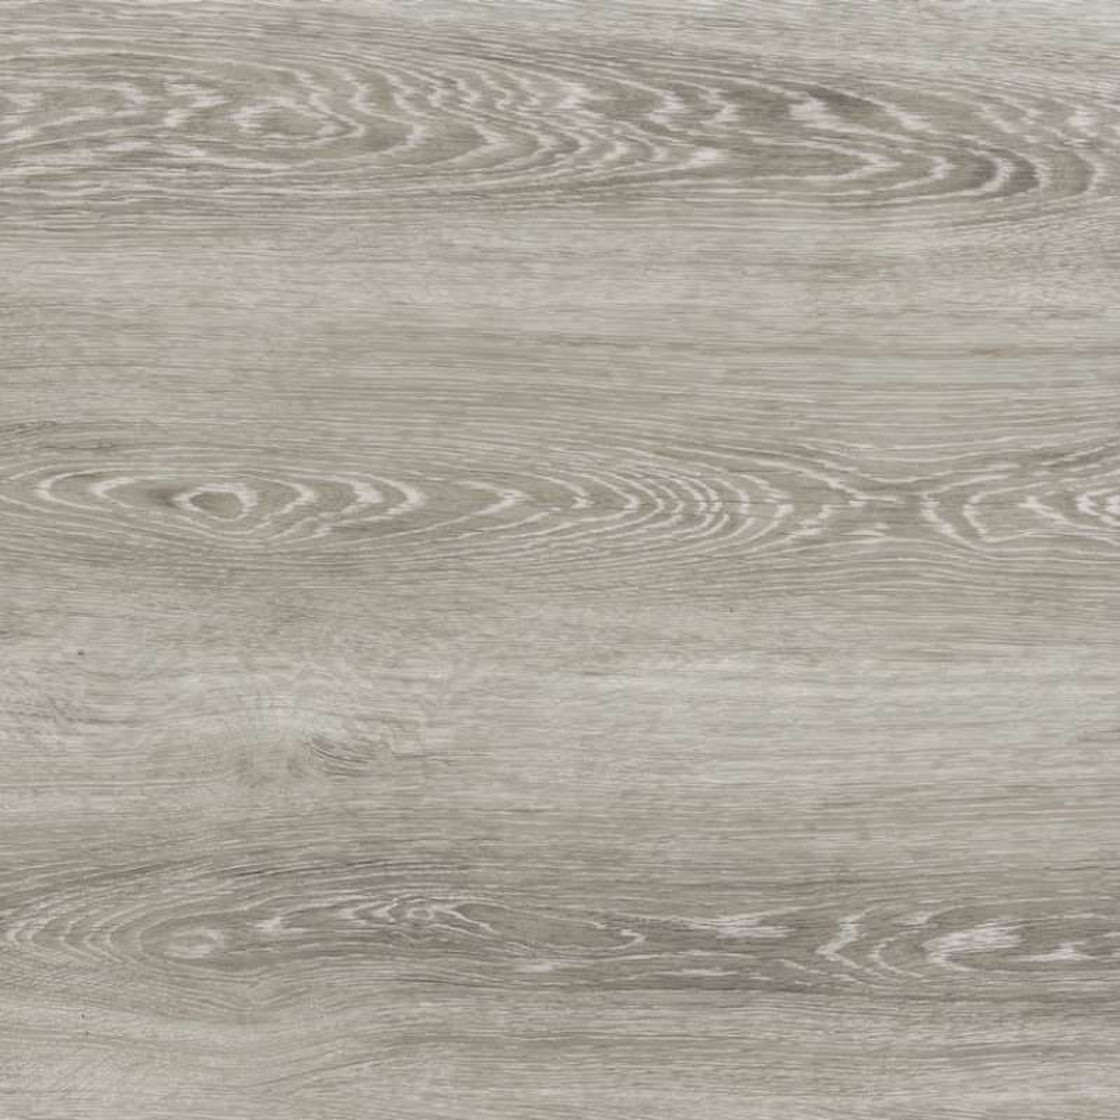 Amtico Signature Limed Grey Wood Luxury Vinyl Flooring Ar0w7670